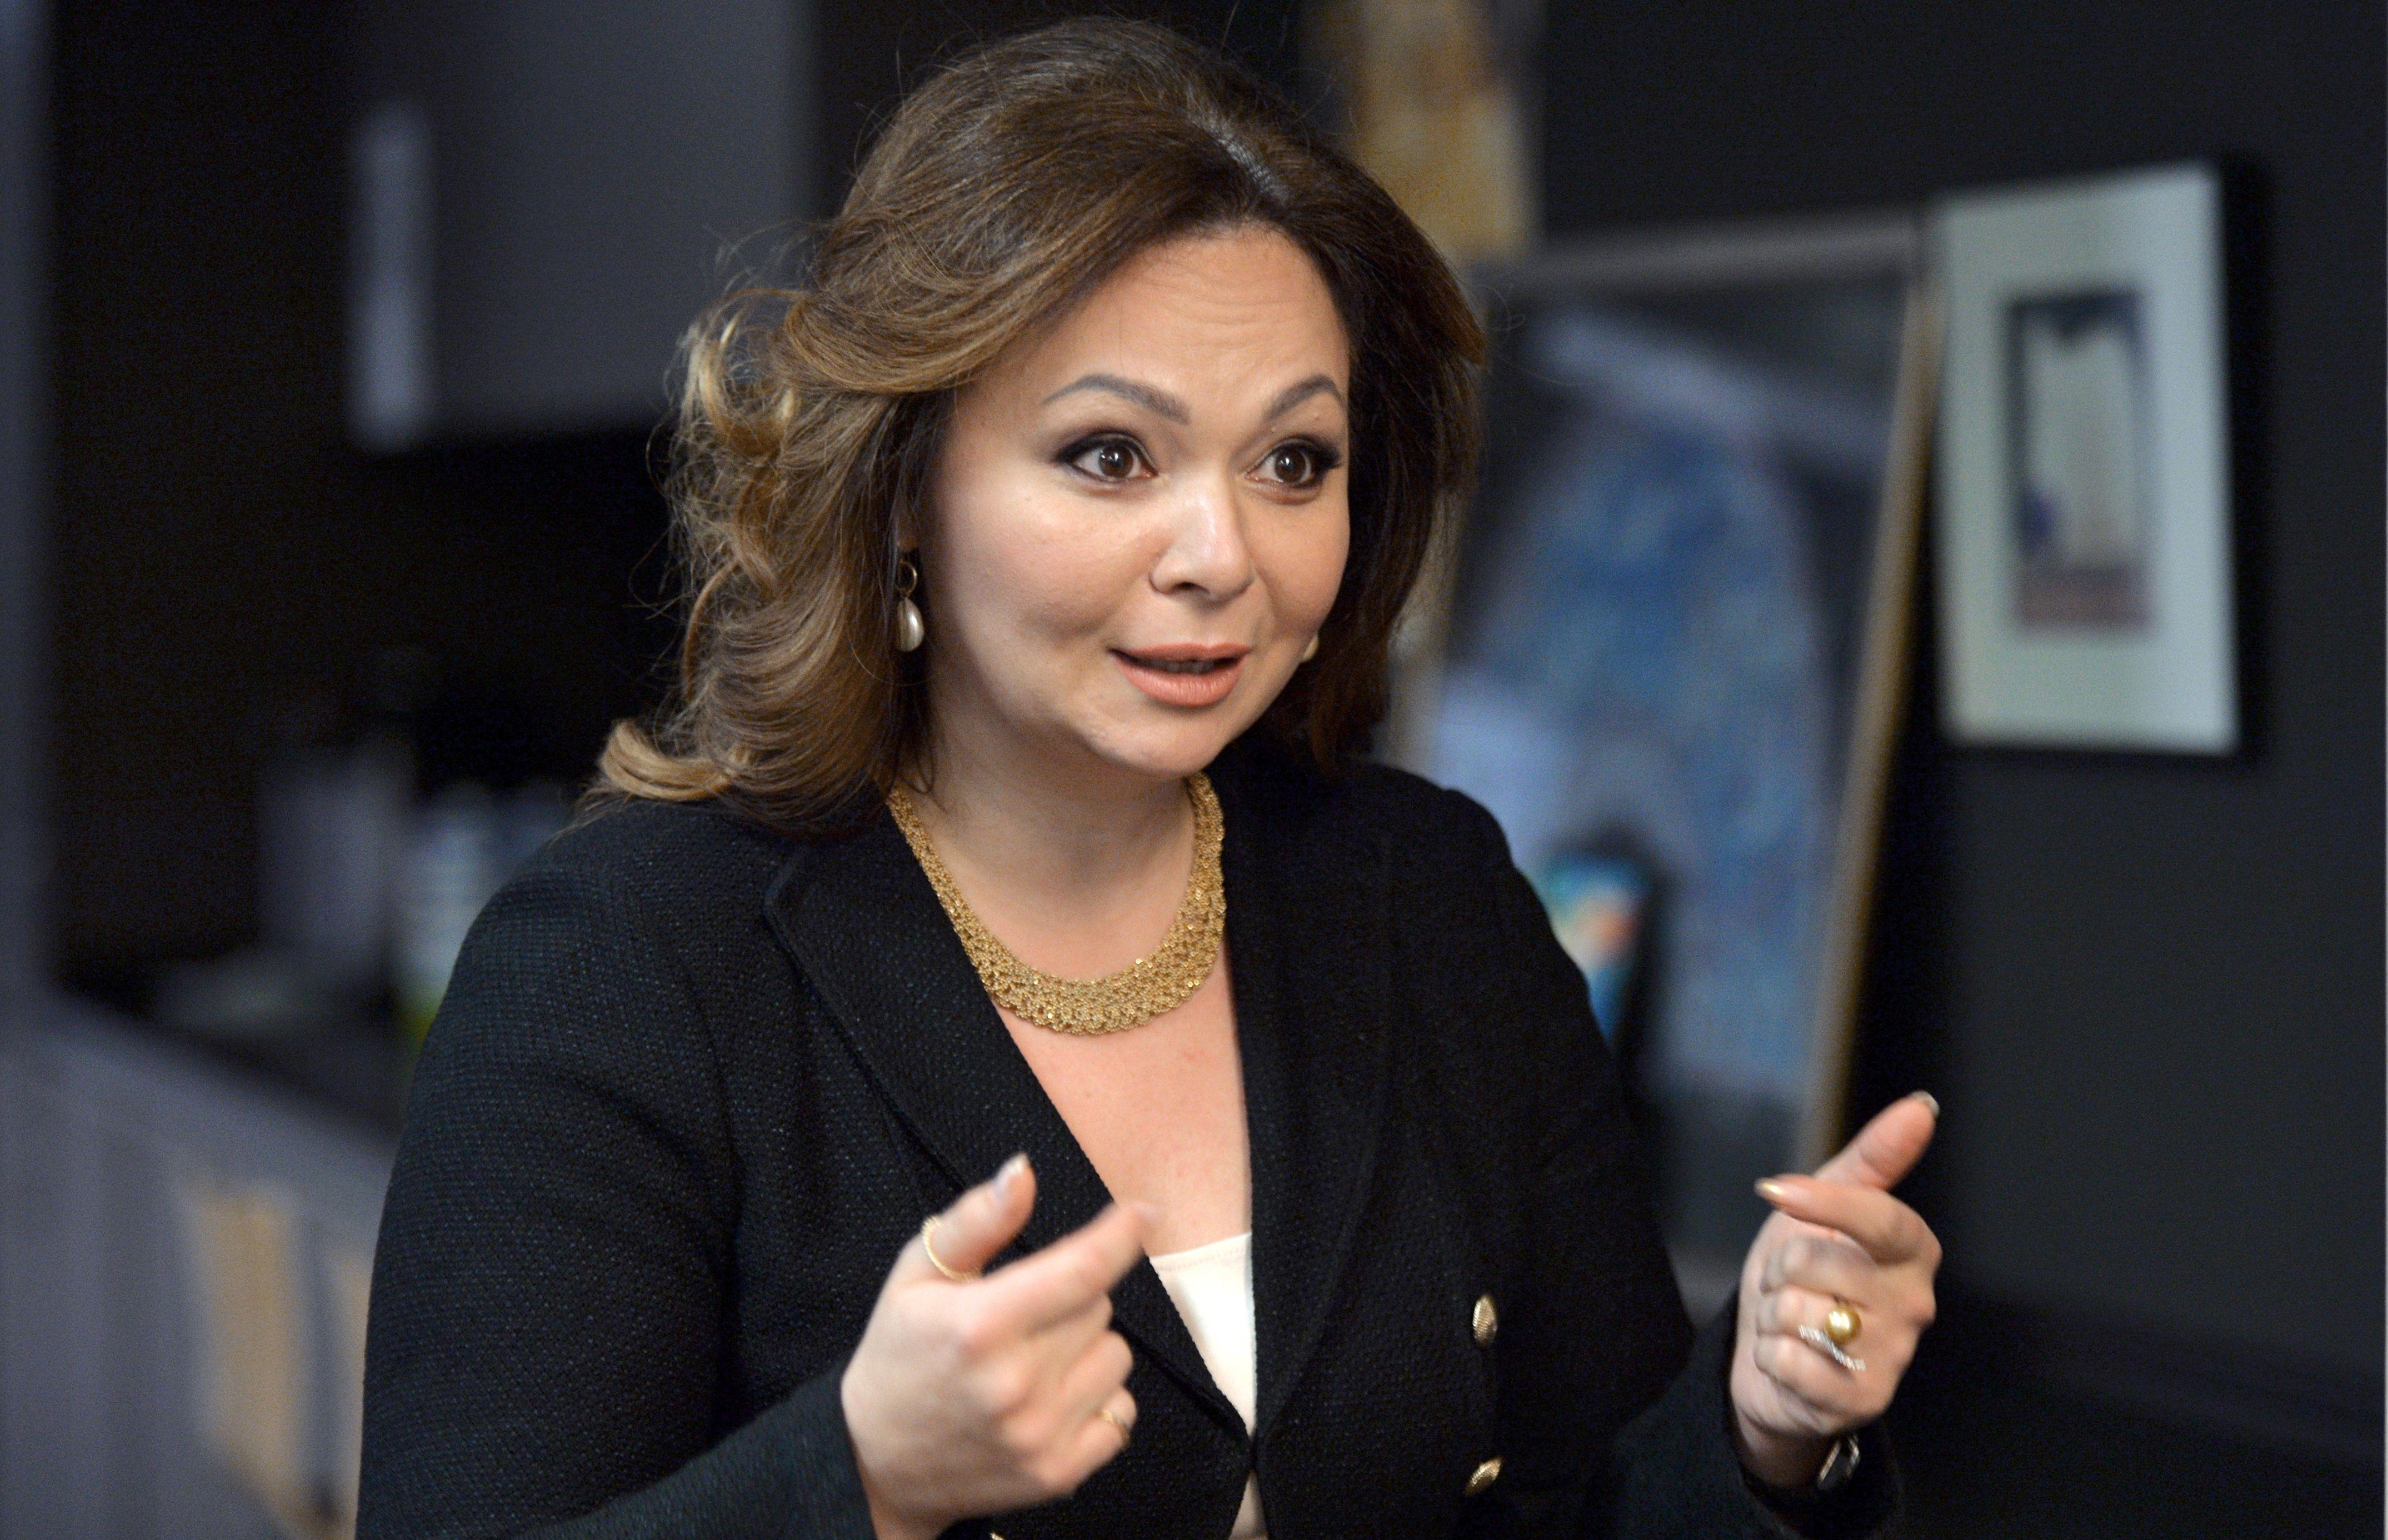 Russian lawyer Natalia Veselnitskaya in Moscow on Nov. 8, 2016. (YURY MARTYANOV/AFP/Getty Images)